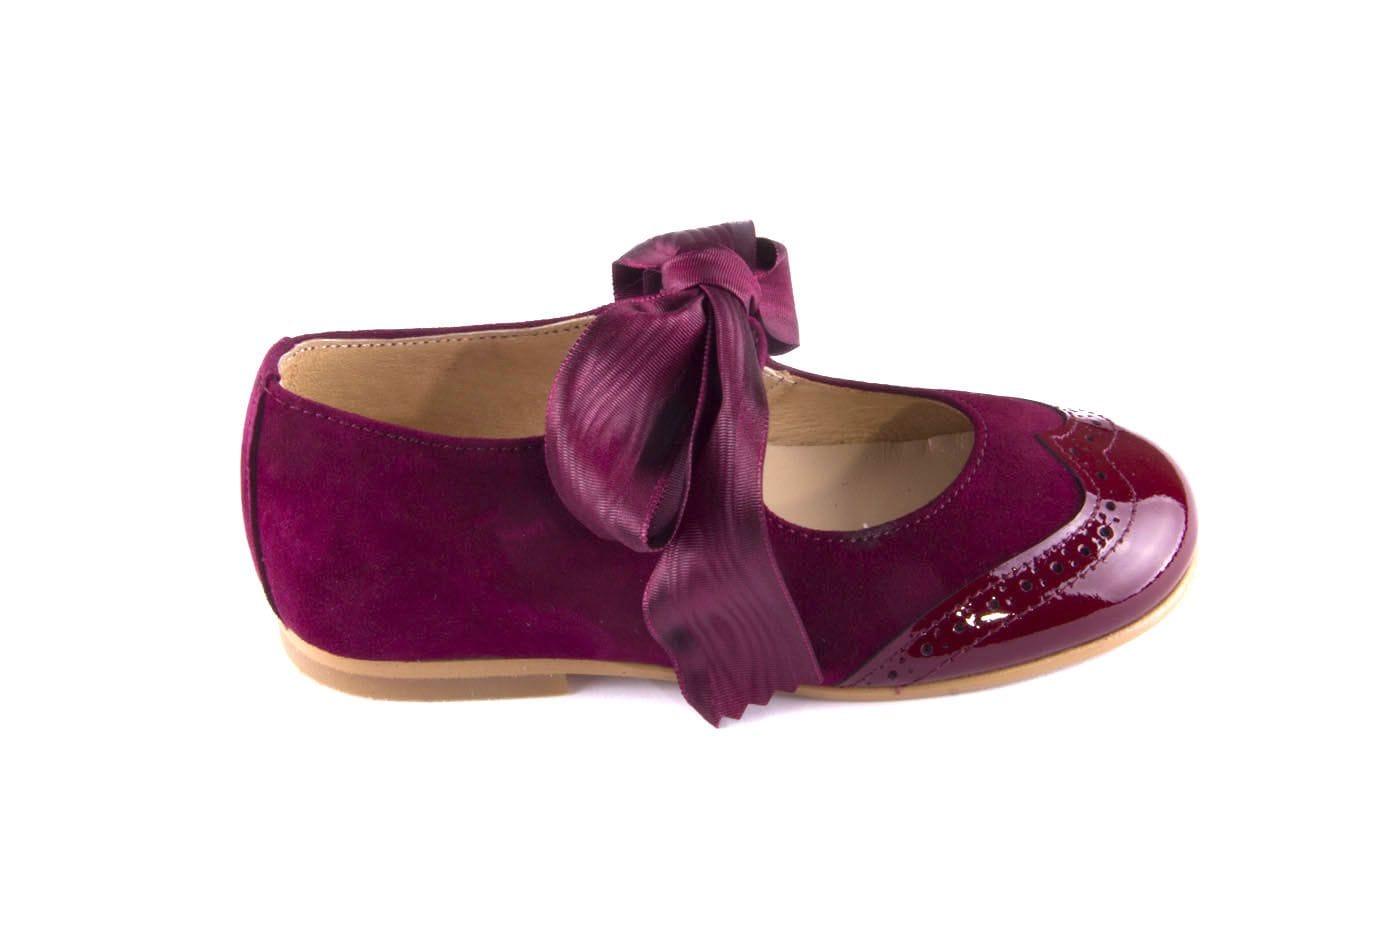 a4630b6a3142f Comprar zapato tipo JOVEN NIÑA estilo MERCEDES COLOR BURDEOS CHAROL ...